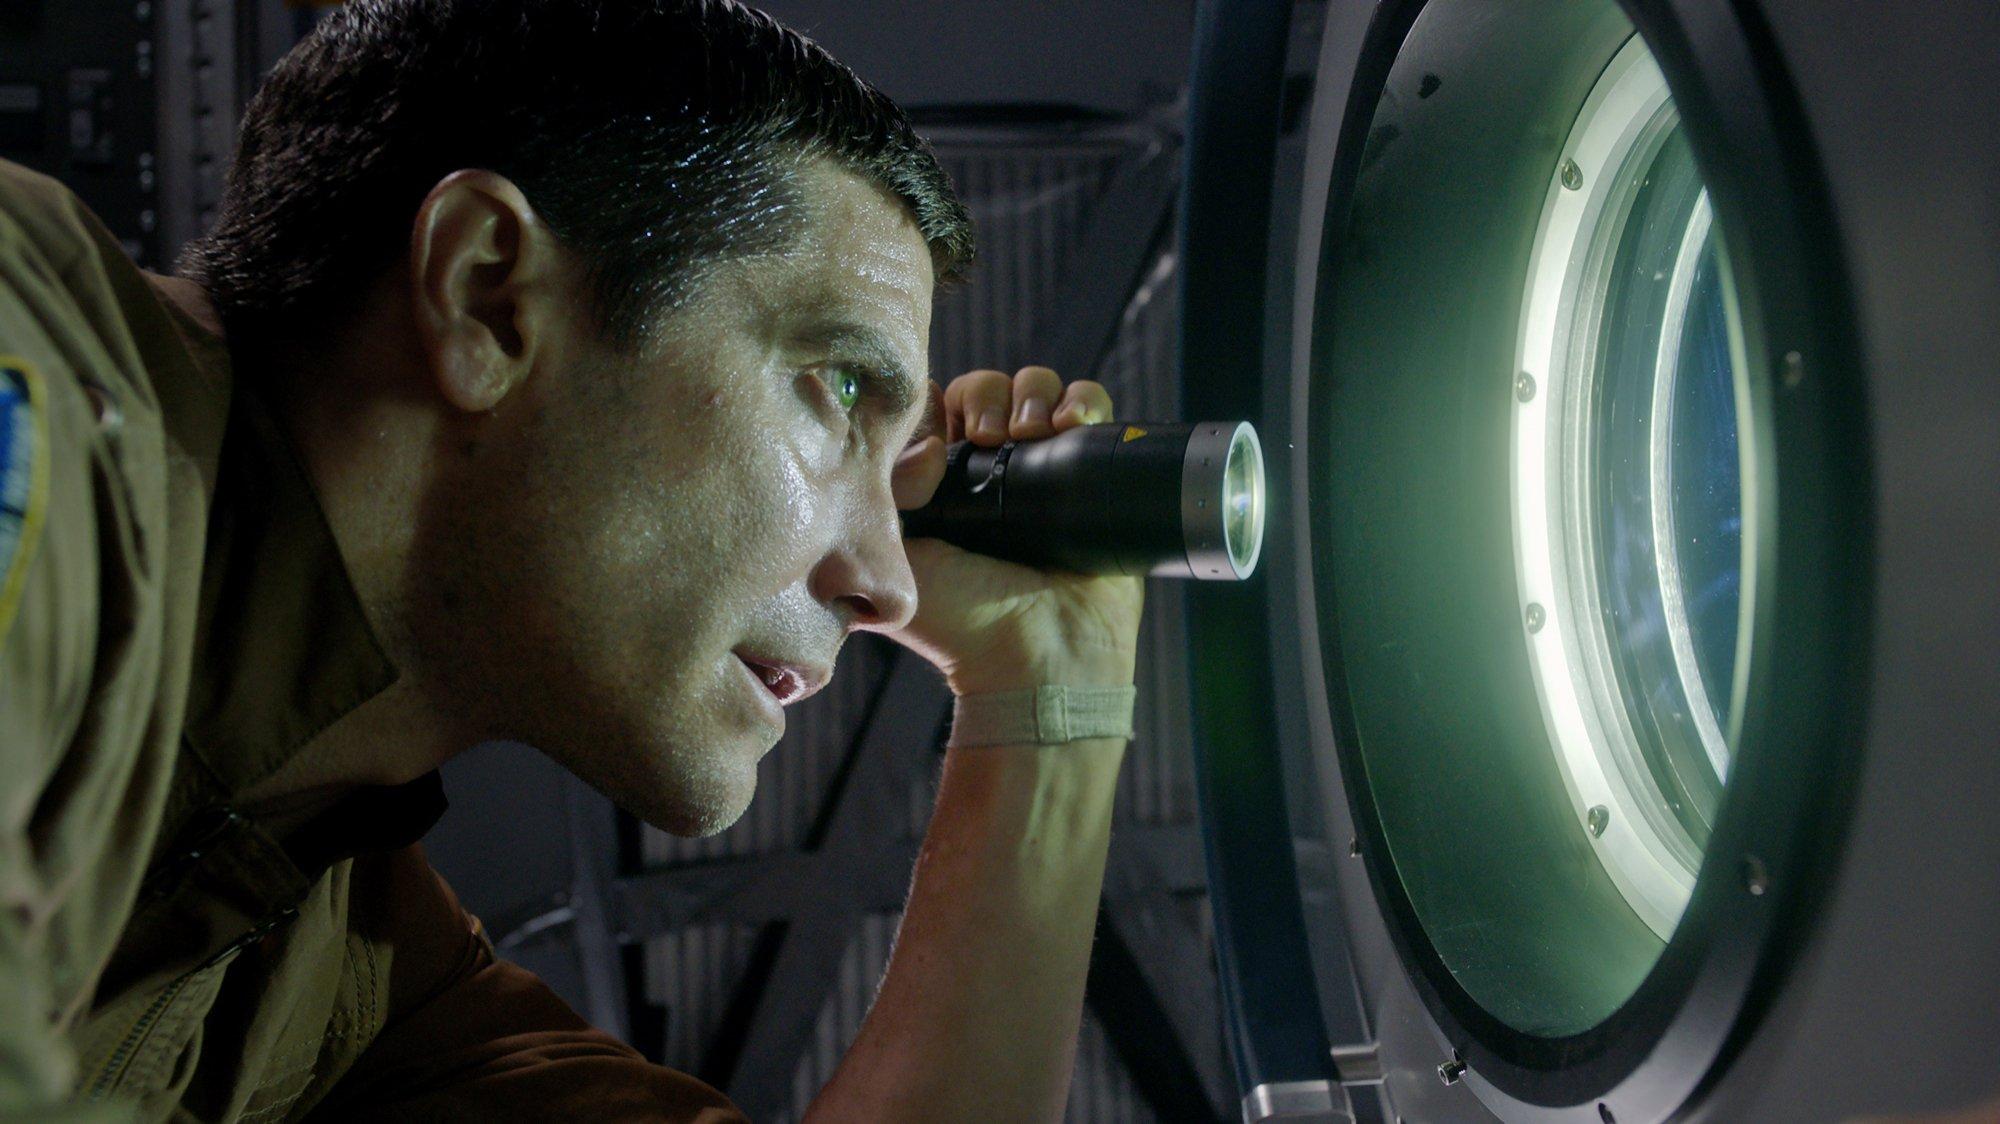 life science fiction alien horror movie sony pictures jake gyllenhaal 2